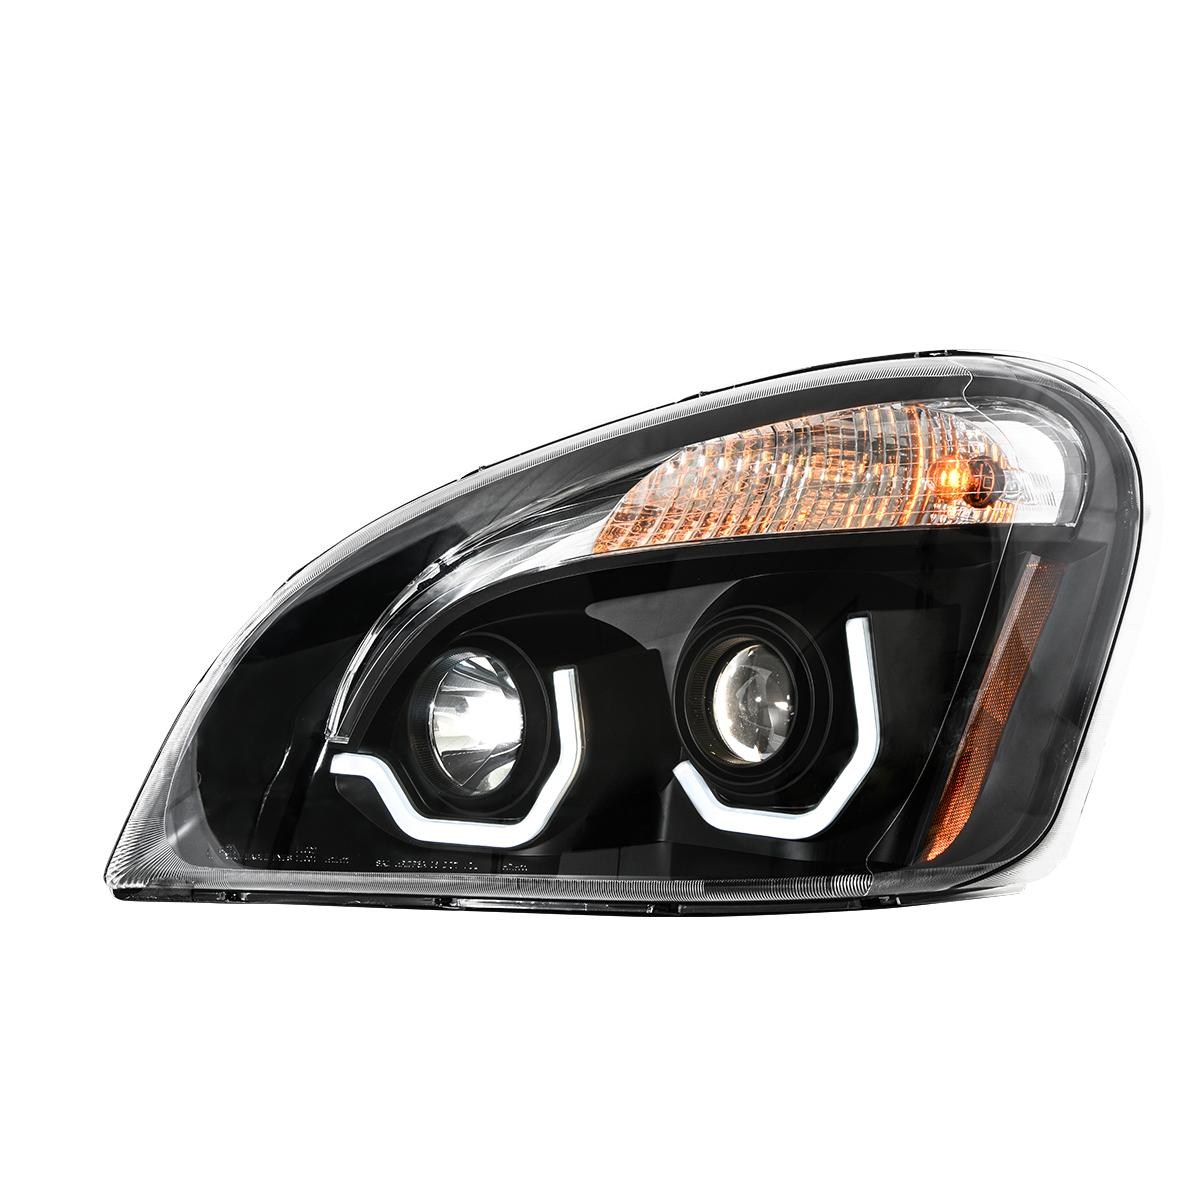 Freightliner Cascadia Matte Black Projector Headlight w/ White LED